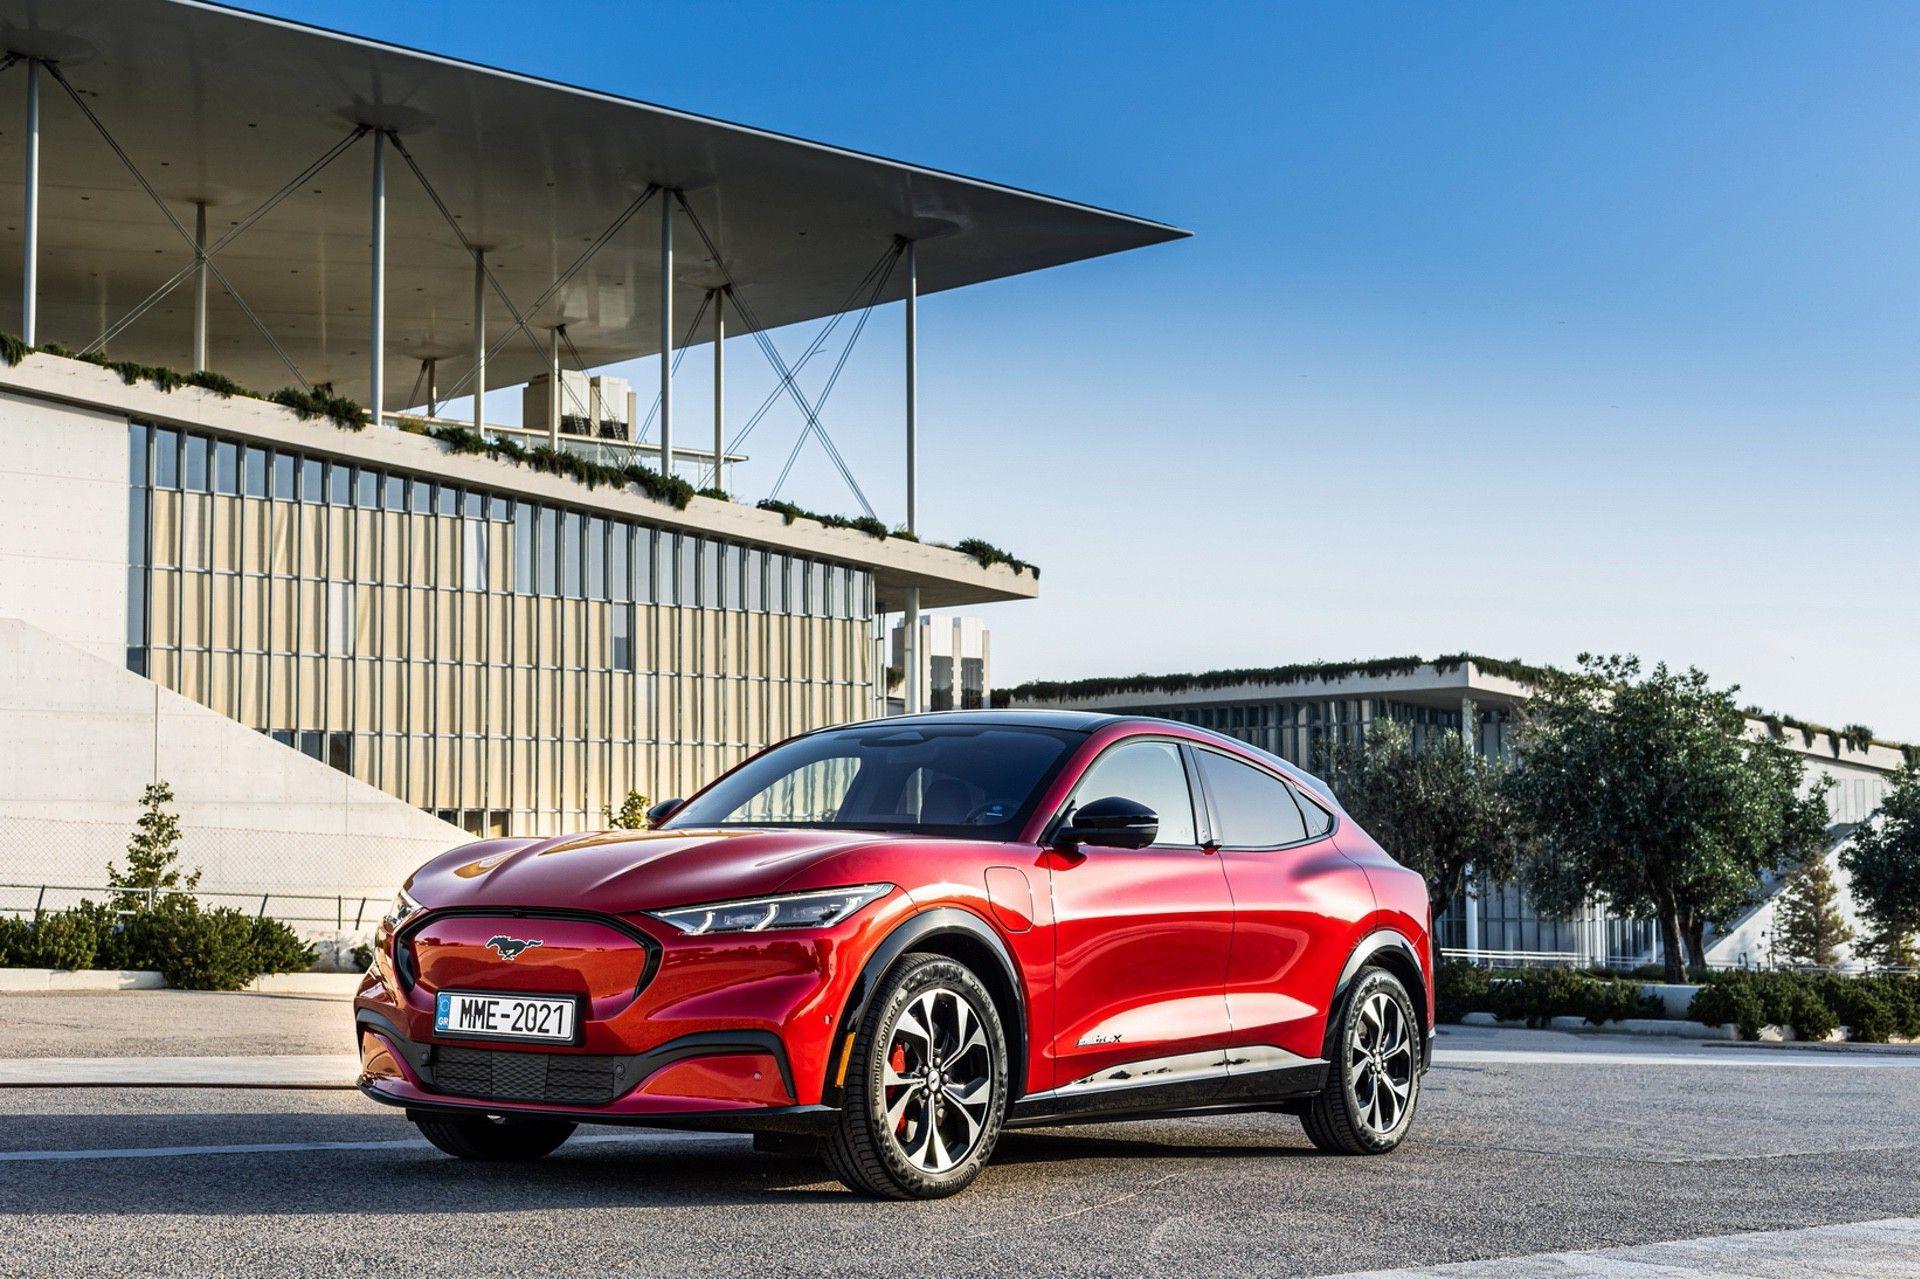 Ford_Mustang_Mach-E_greek_presskit-0019